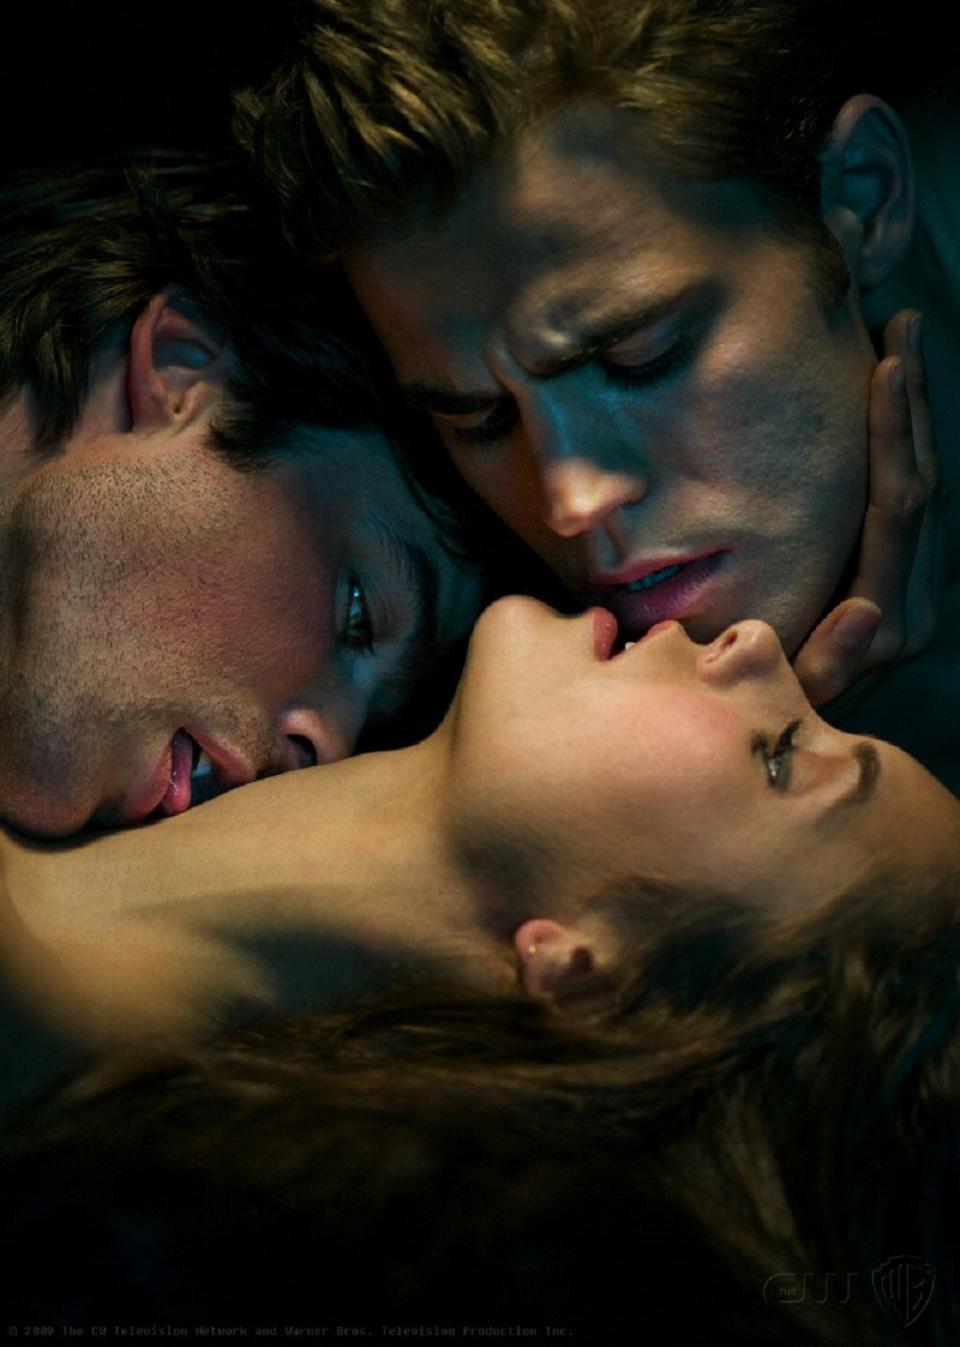 Black damon erotic stories sexy movie